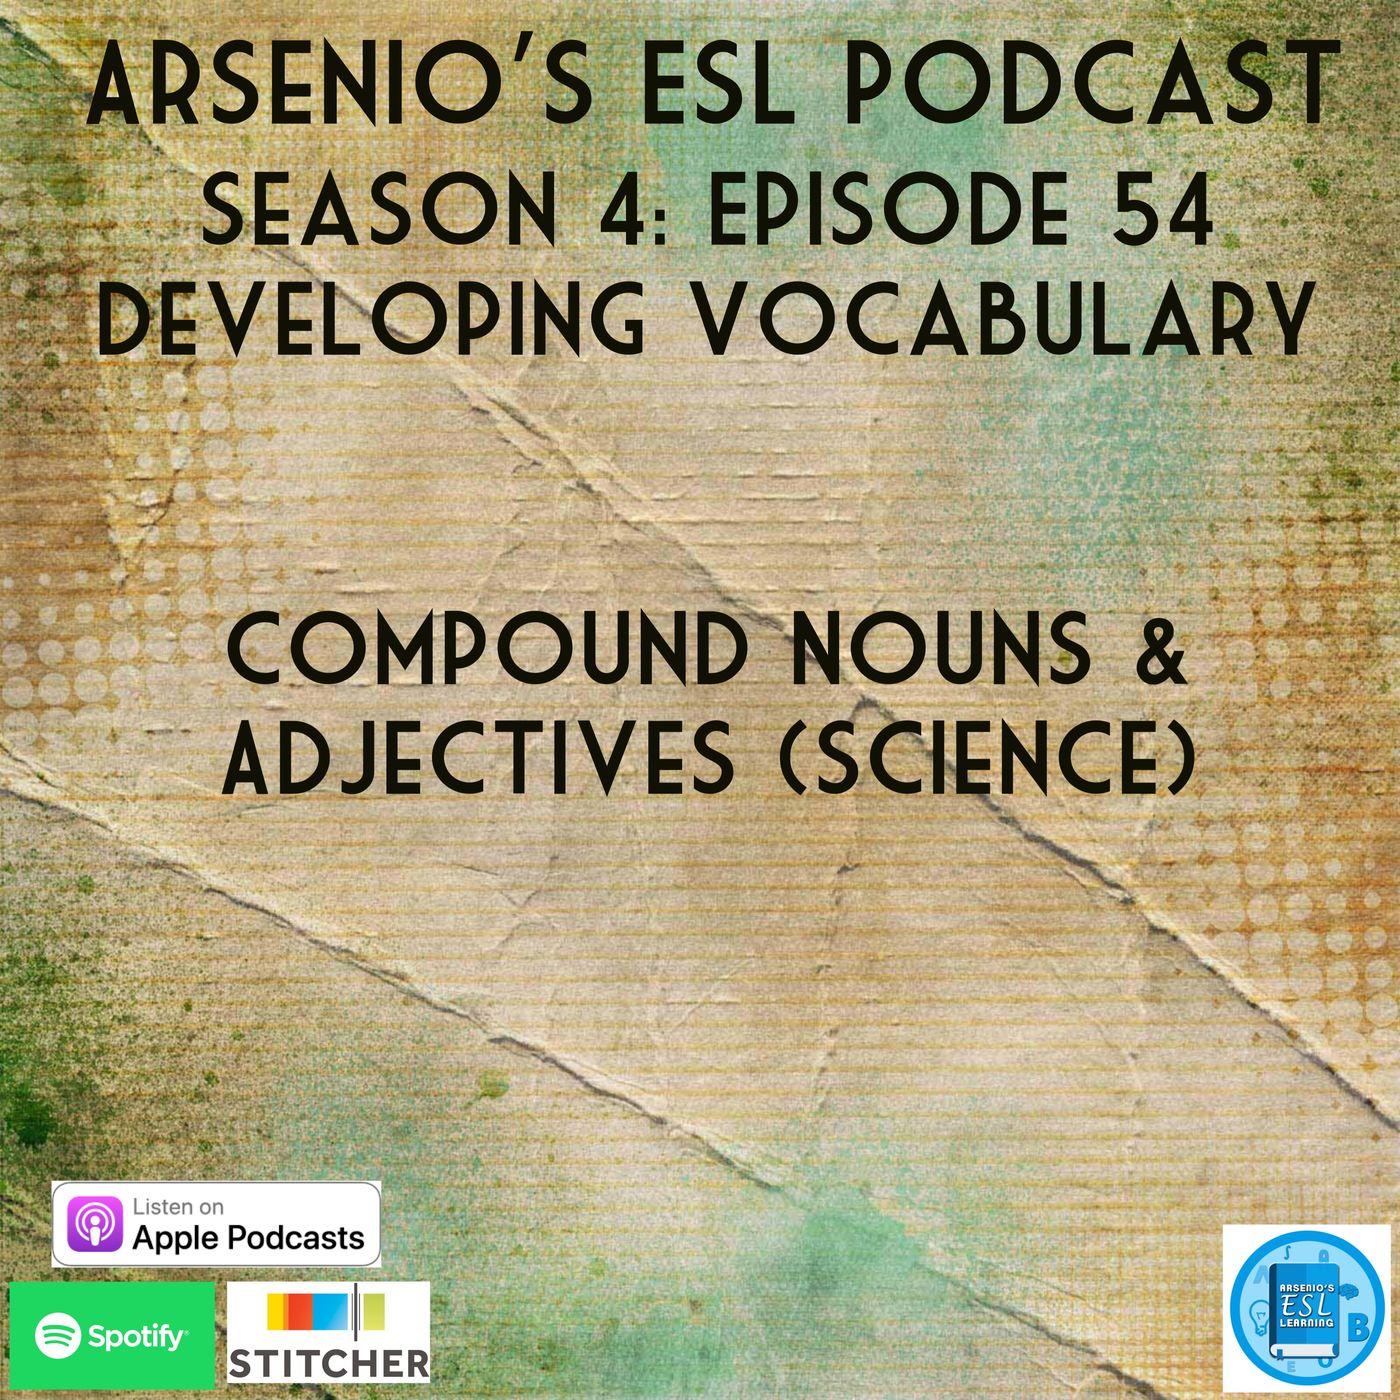 Arsenio's ESL Podcast: Season 4 - Episode 54 - Developing Vocabulary - Compound Nouns & Adjectives (Science)